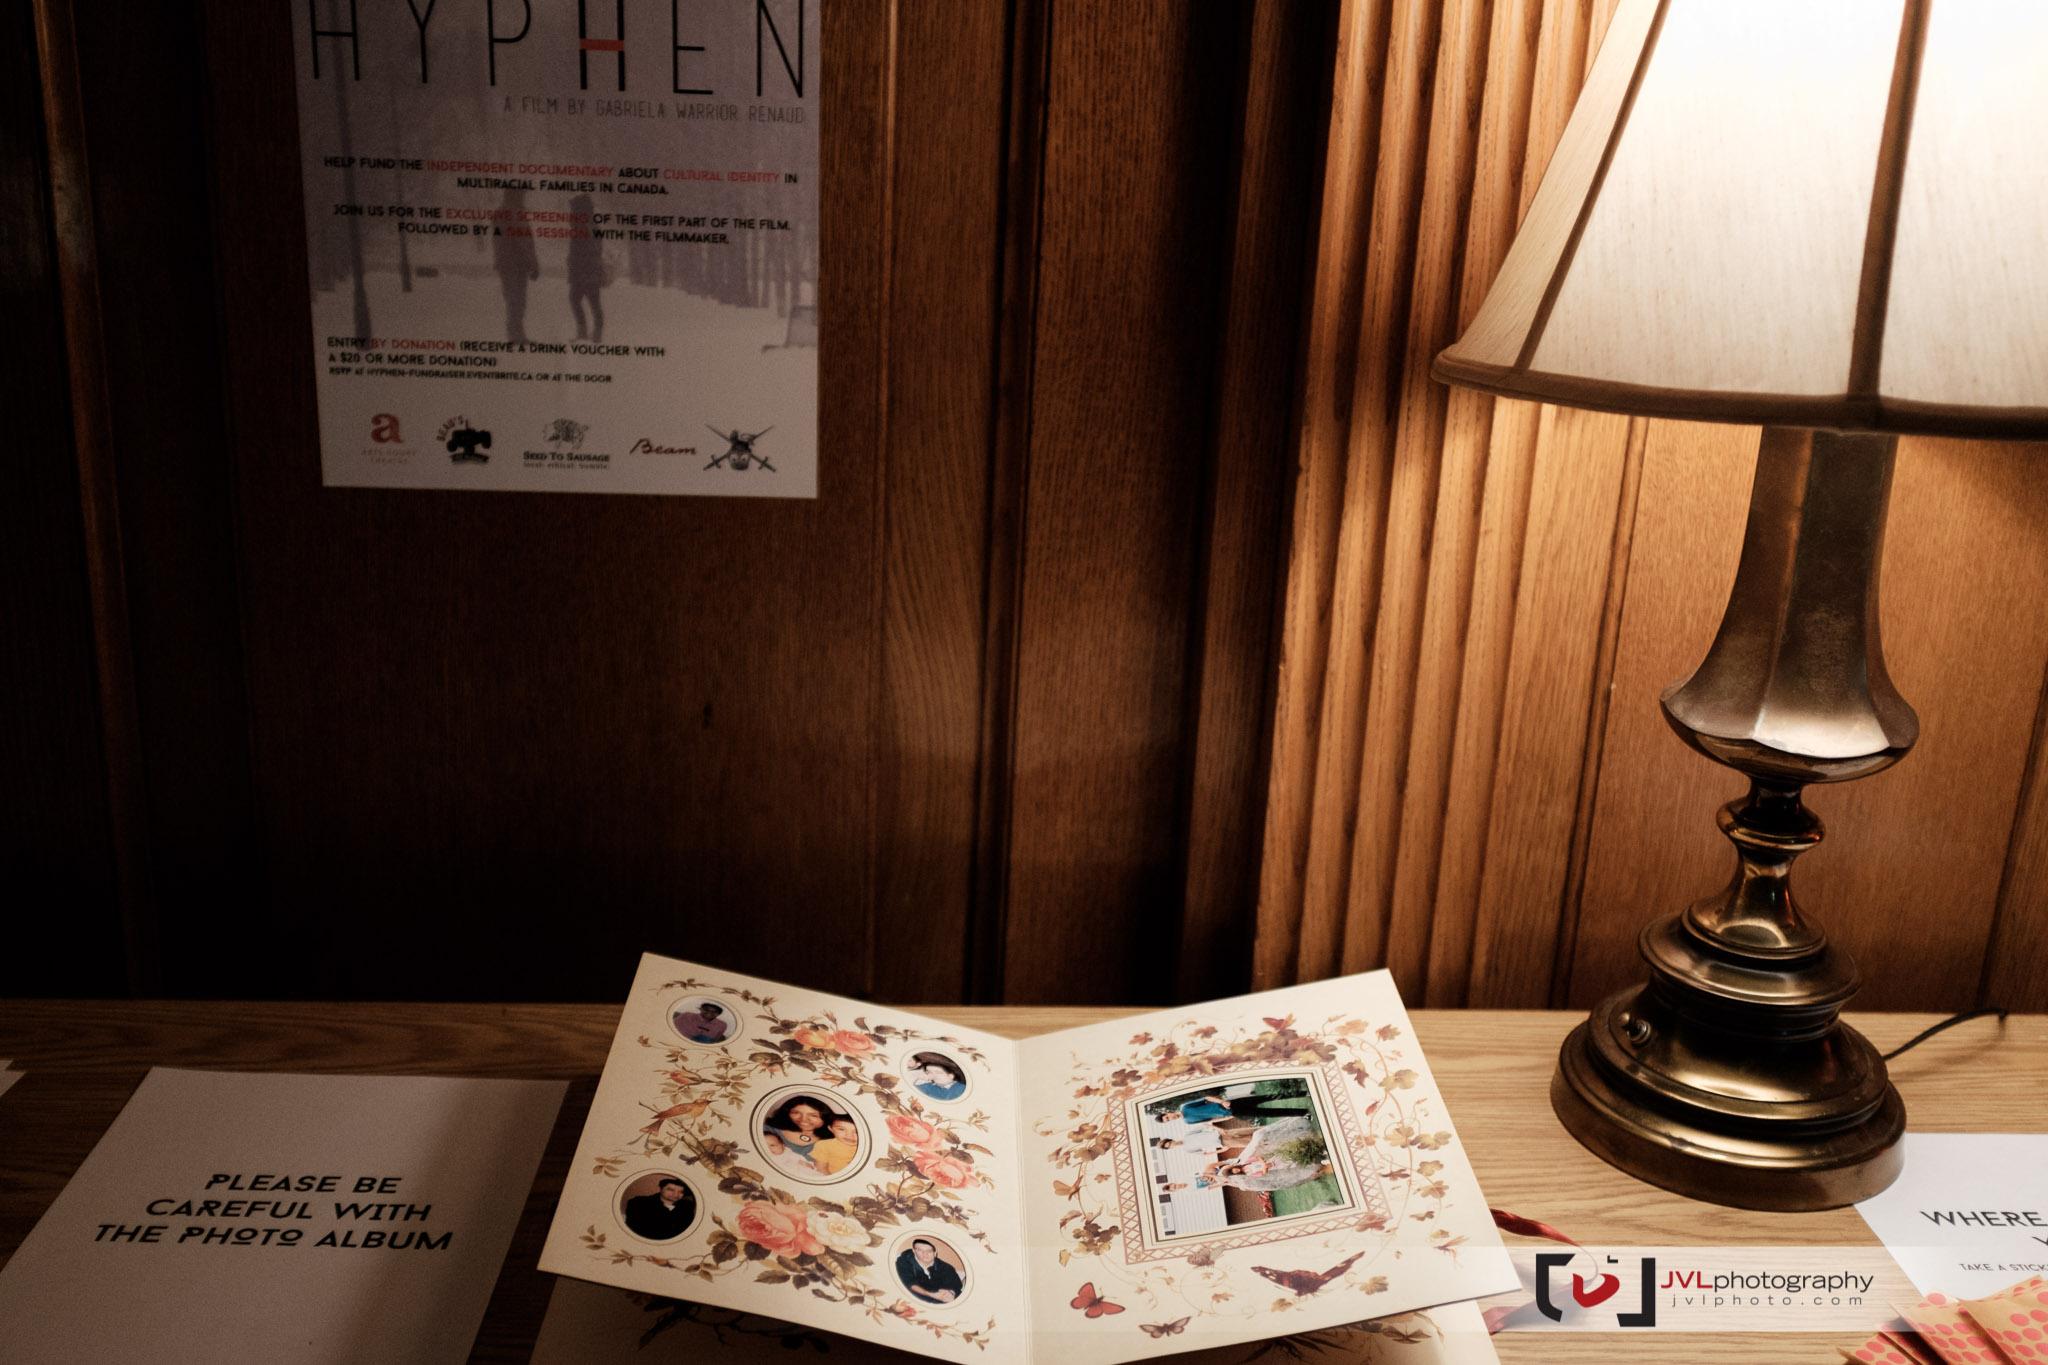 Hyphen-5-JVLphoto.jpg